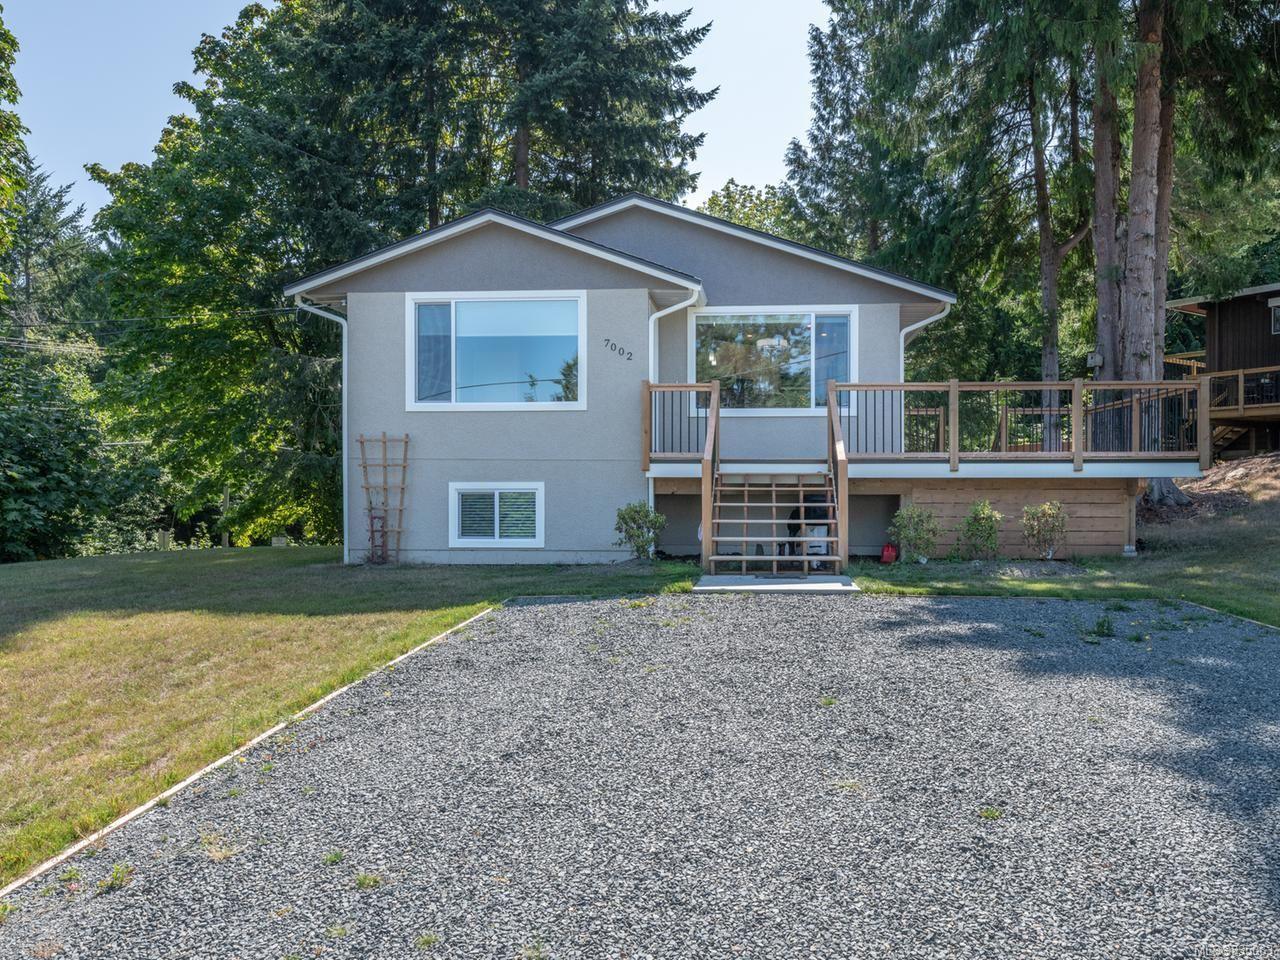 Main Photo: 7002 Warick Rd in LANTZVILLE: Na Lower Lantzville House for sale (Nanaimo)  : MLS®# 835063